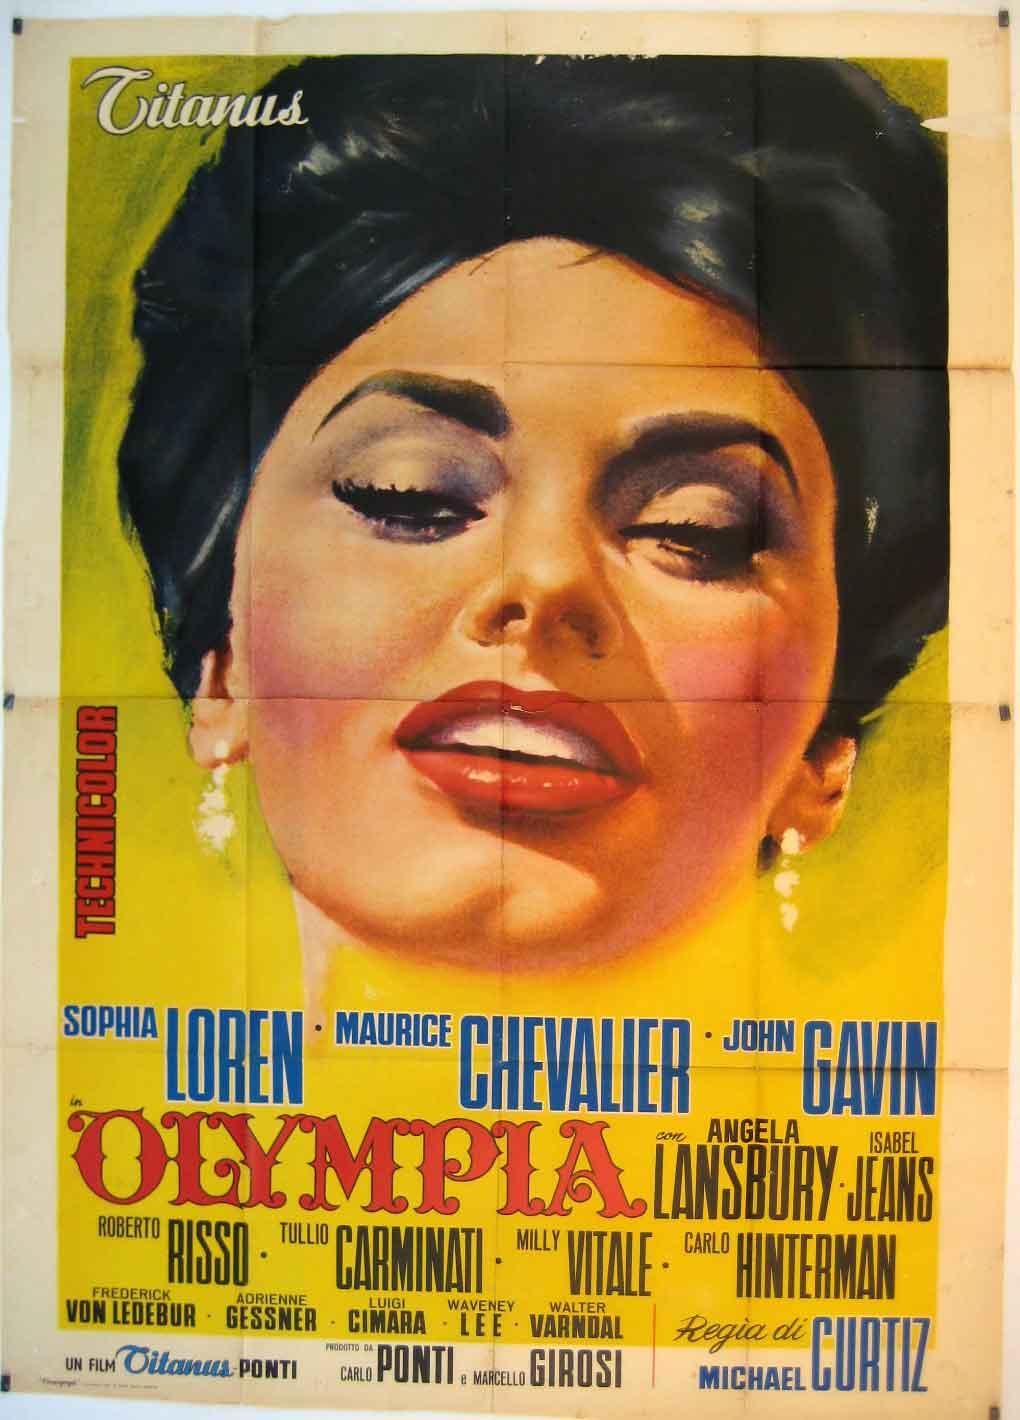 Sophia Loren  Lucky To Be A Woman  Amazoncom Music